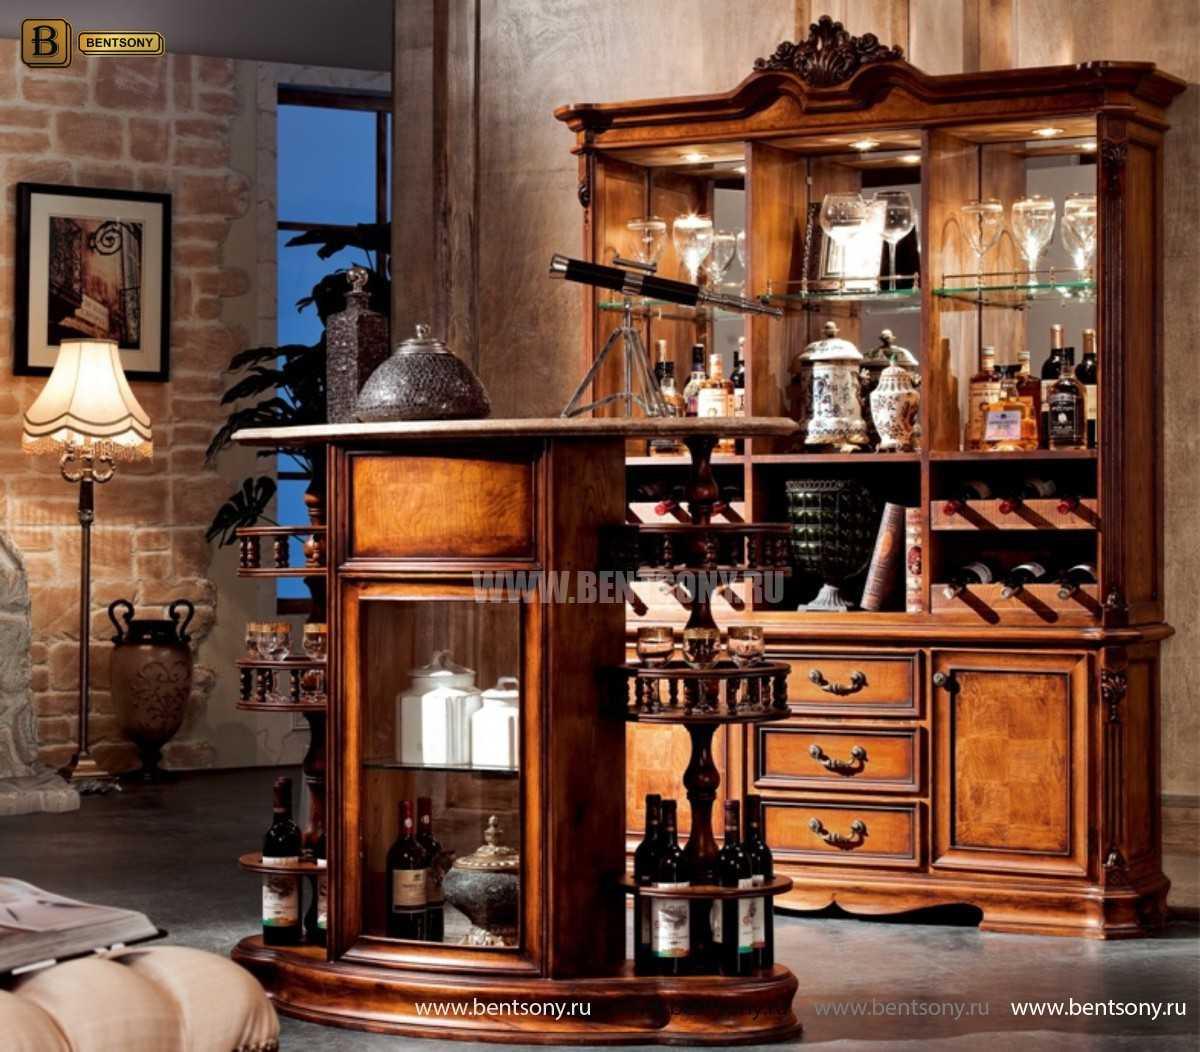 Буфет Феникс (Классика, Барный шкаф)  каталог мебели с ценами